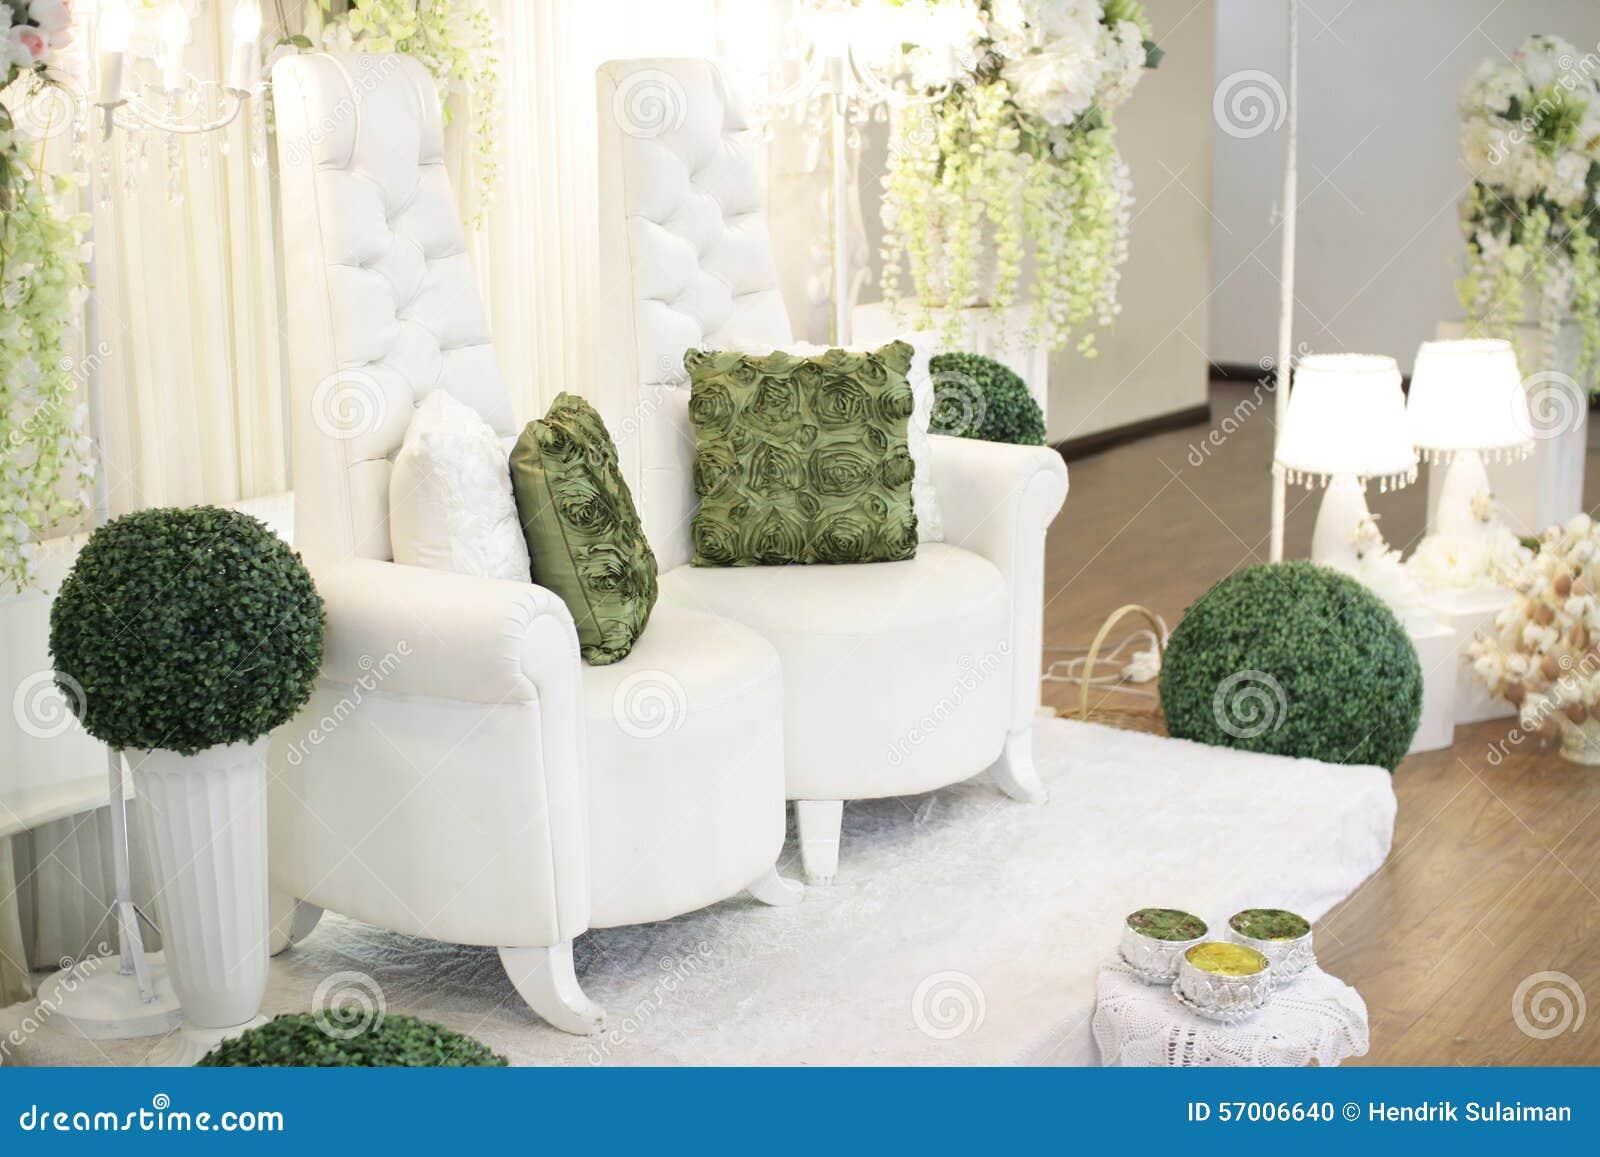 Exelent Malay Wedding Theme Ideas Pattern - The Wedding Ideas ...